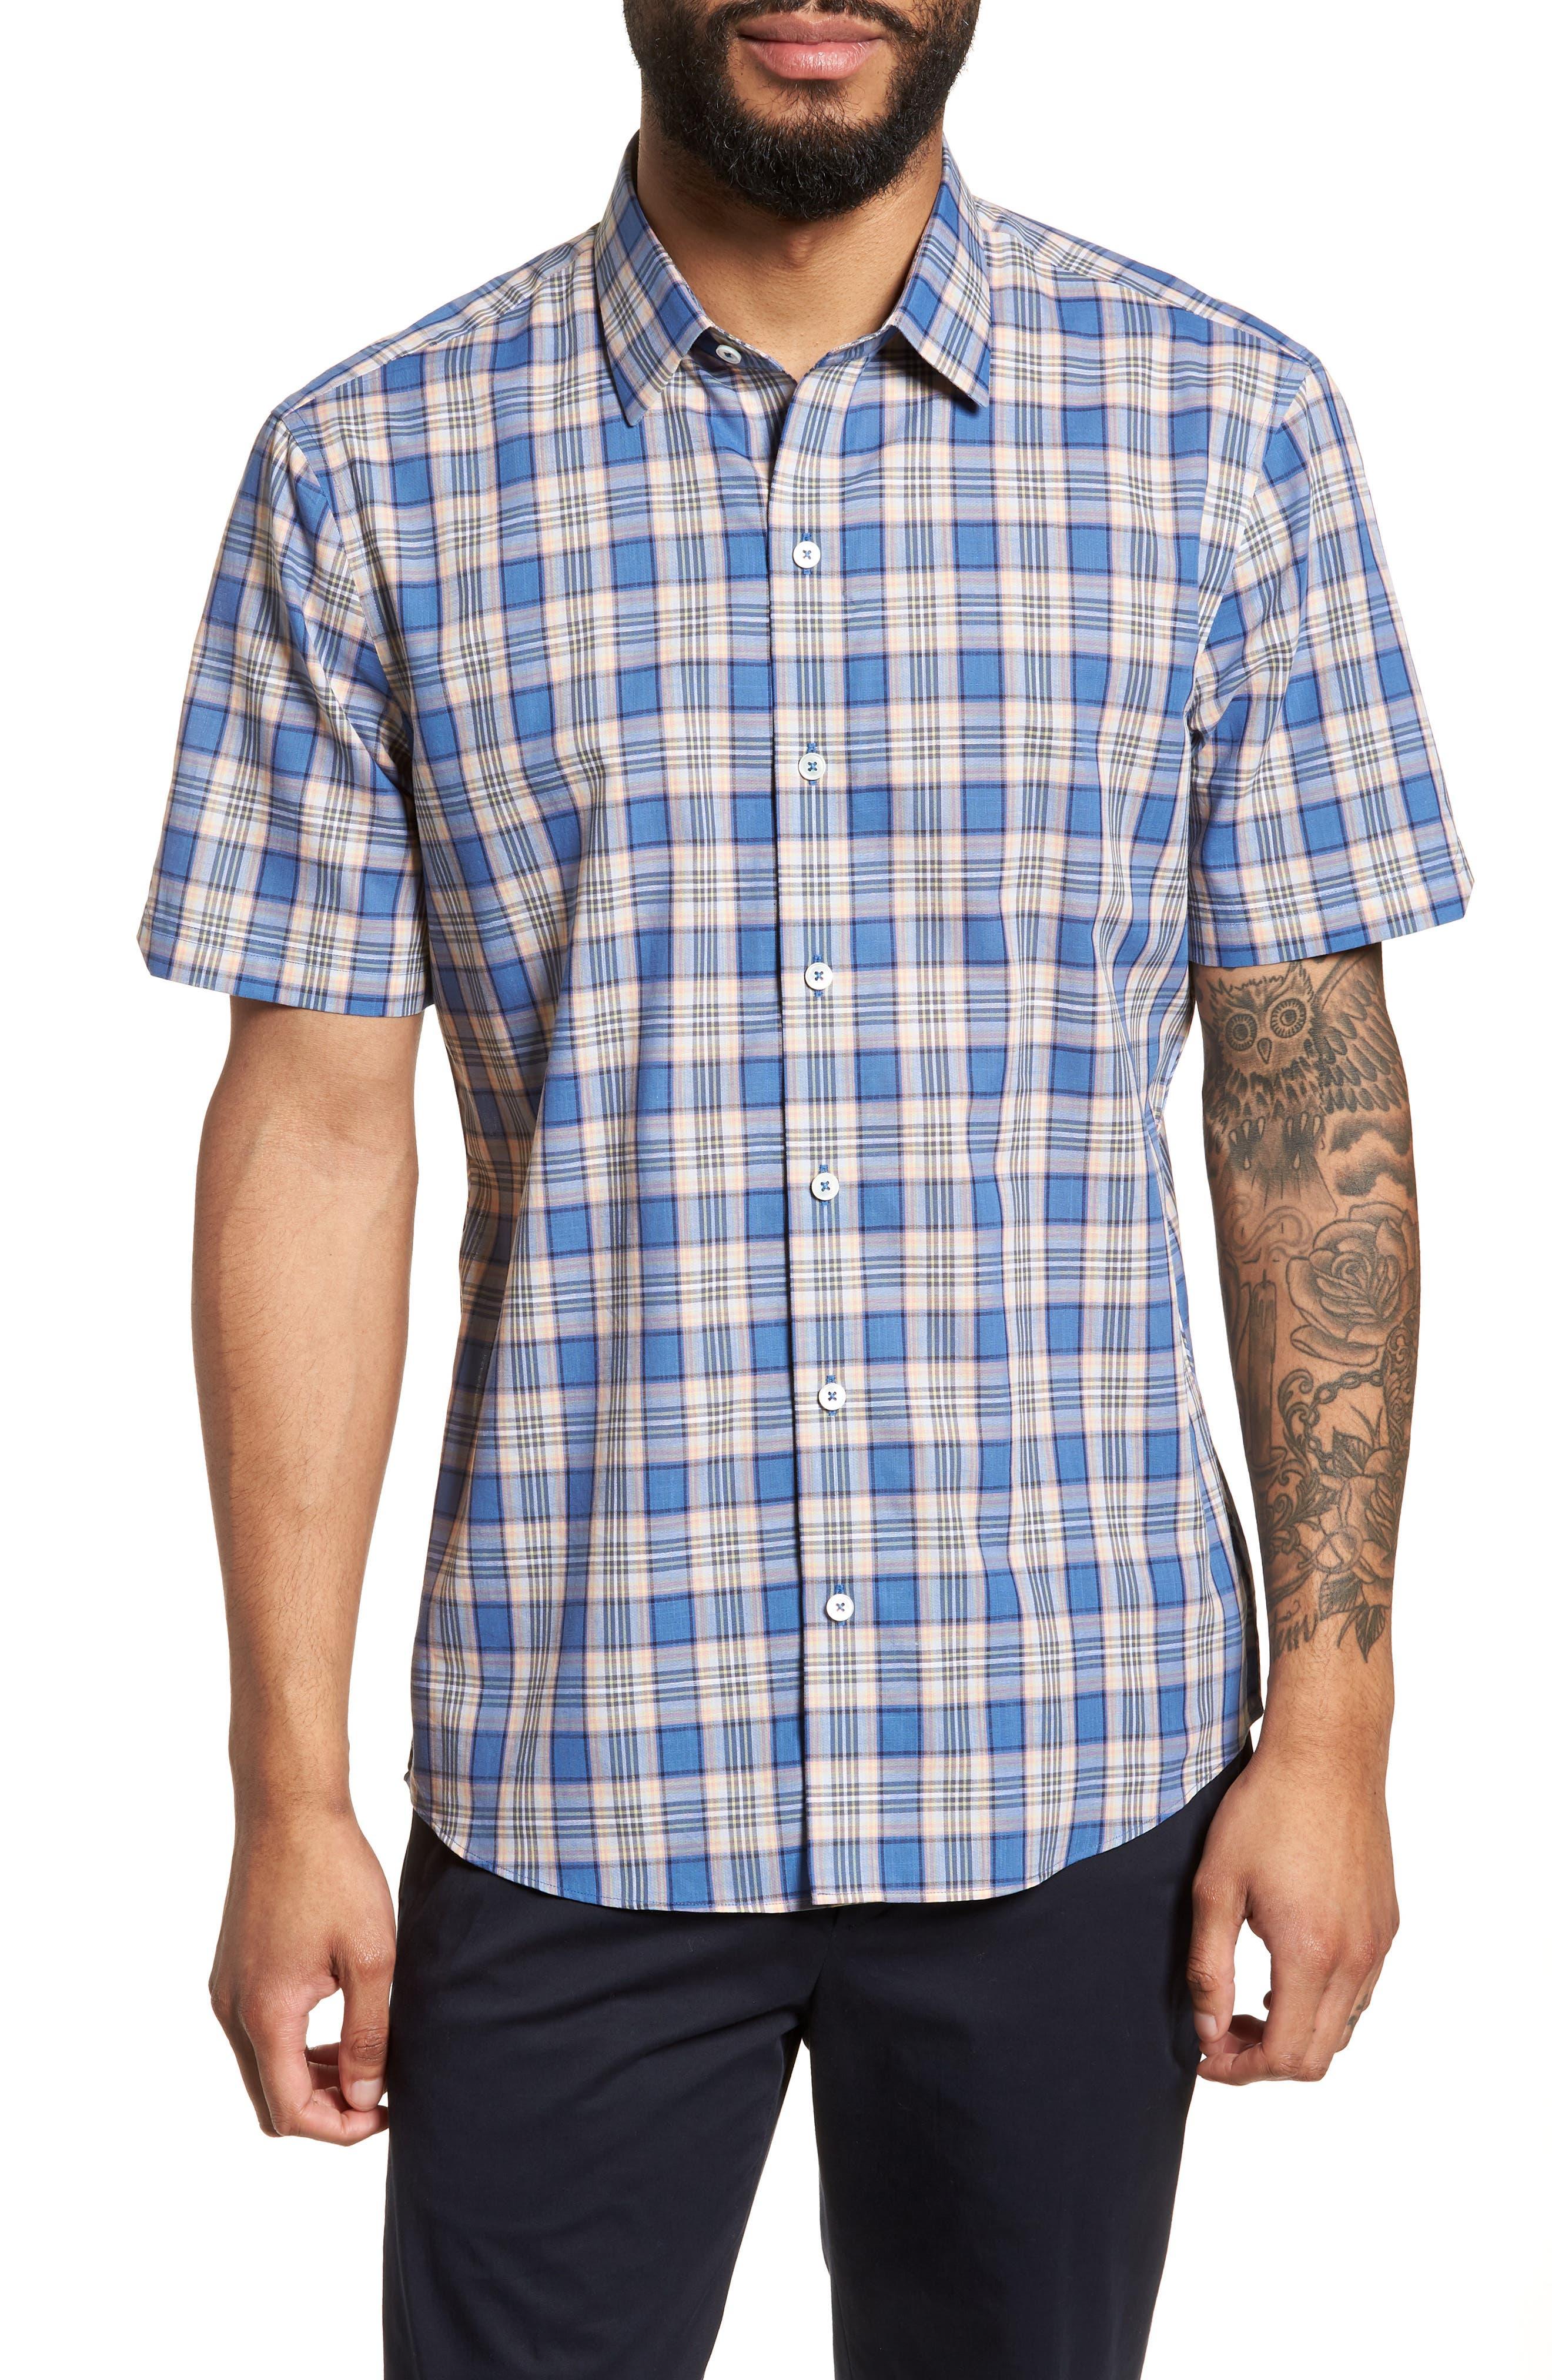 Alternate Image 1 Selected - Zachary Prell Carter Plaid Sport Shirt